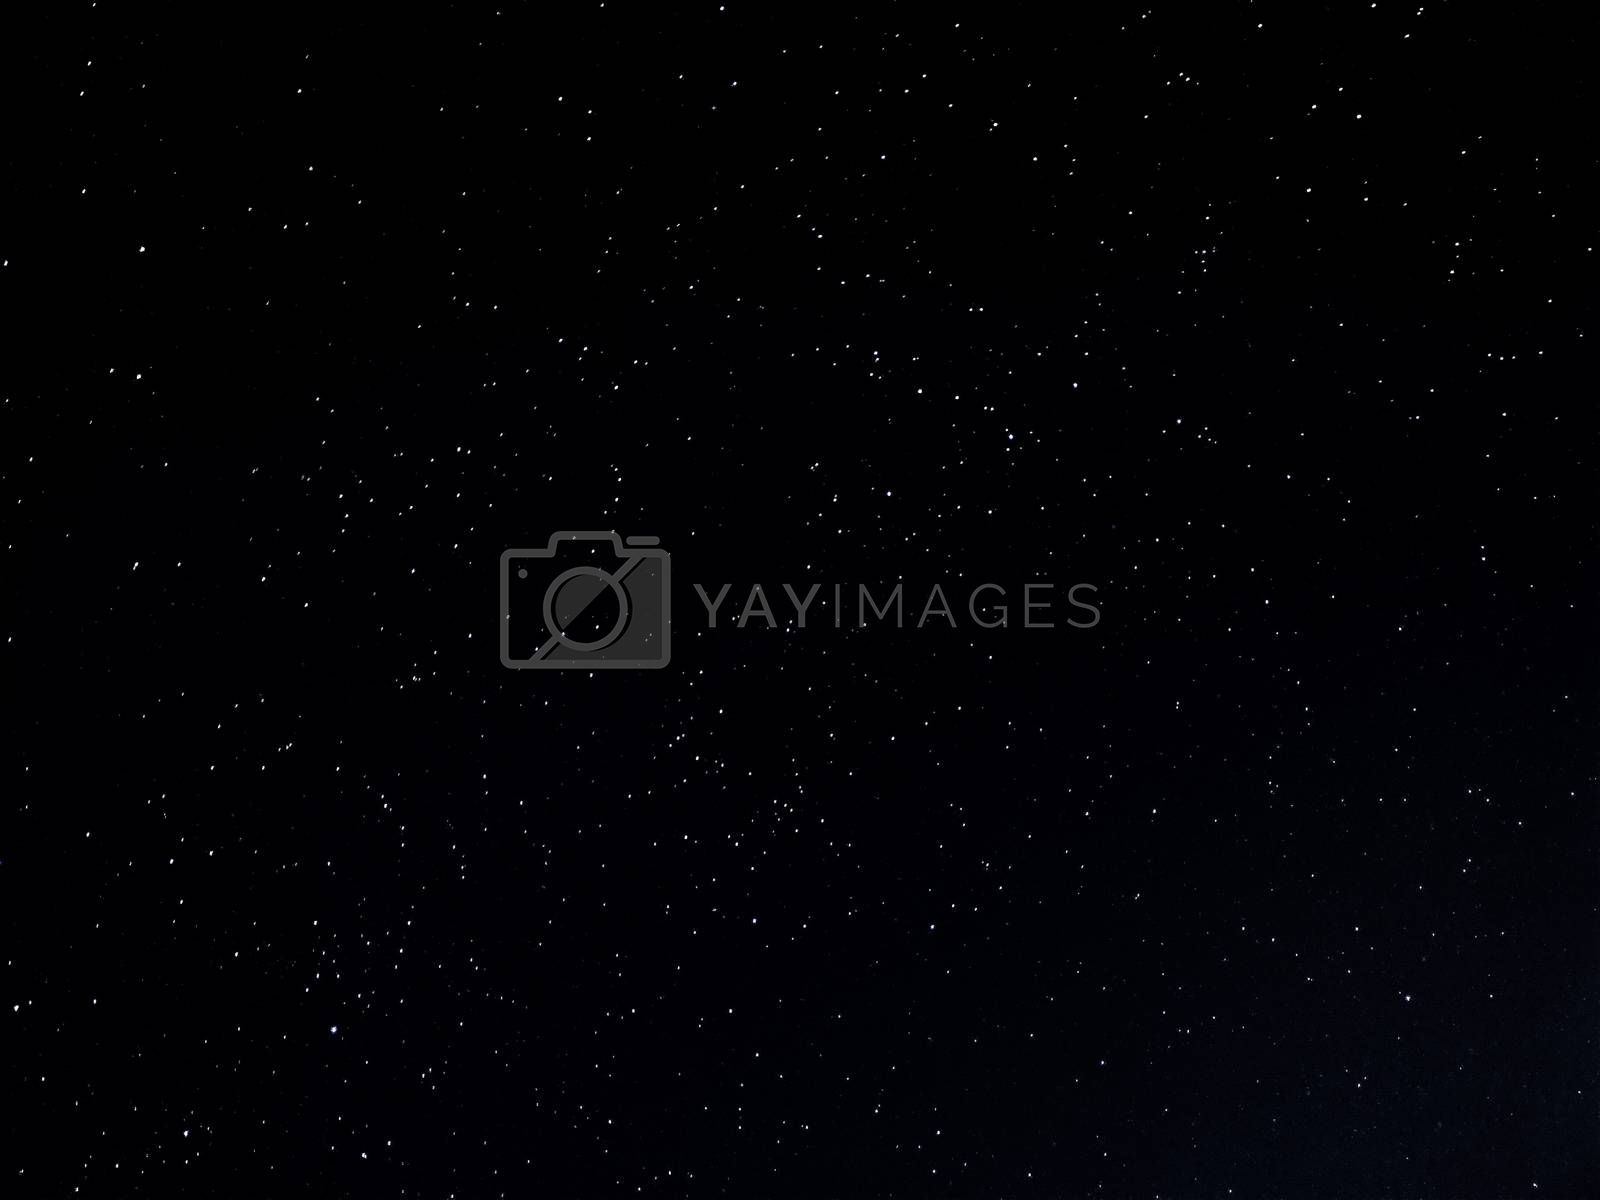 Dark background of stars in long exposure